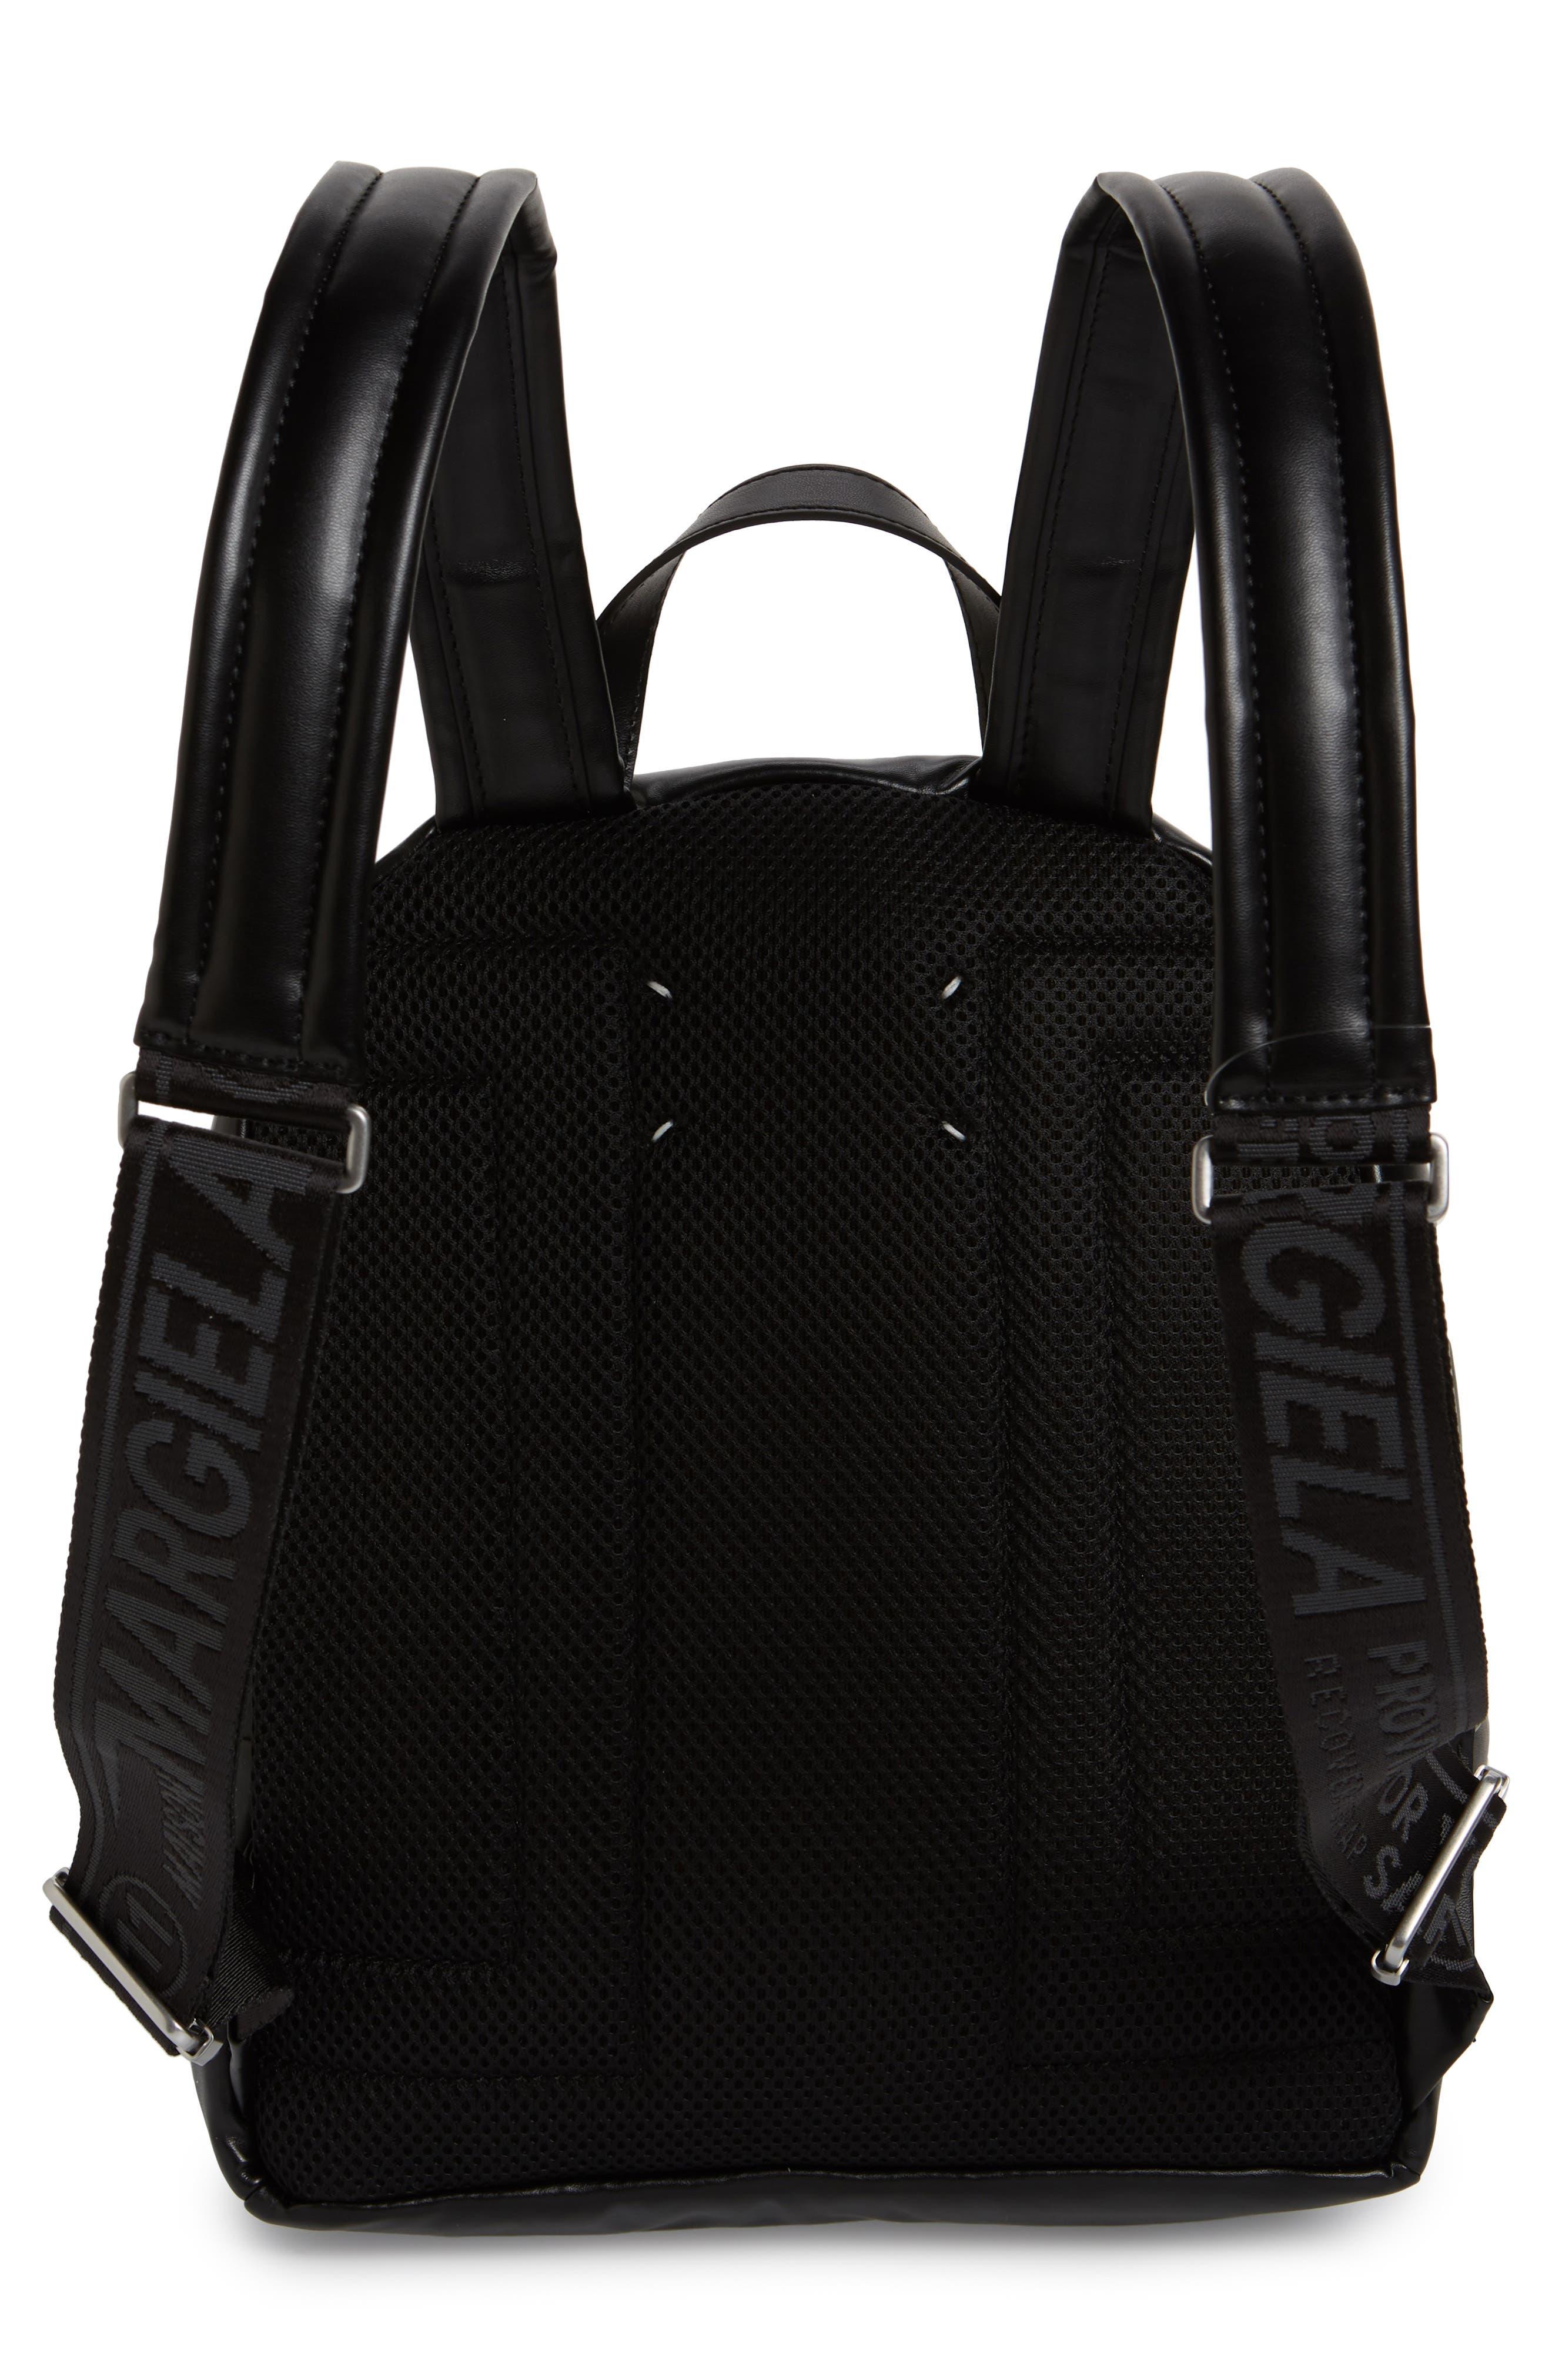 MAISON MARGIELA,                             Medium Number Print Faux Leather Backpack,                             Alternate thumbnail 3, color,                             BLACK